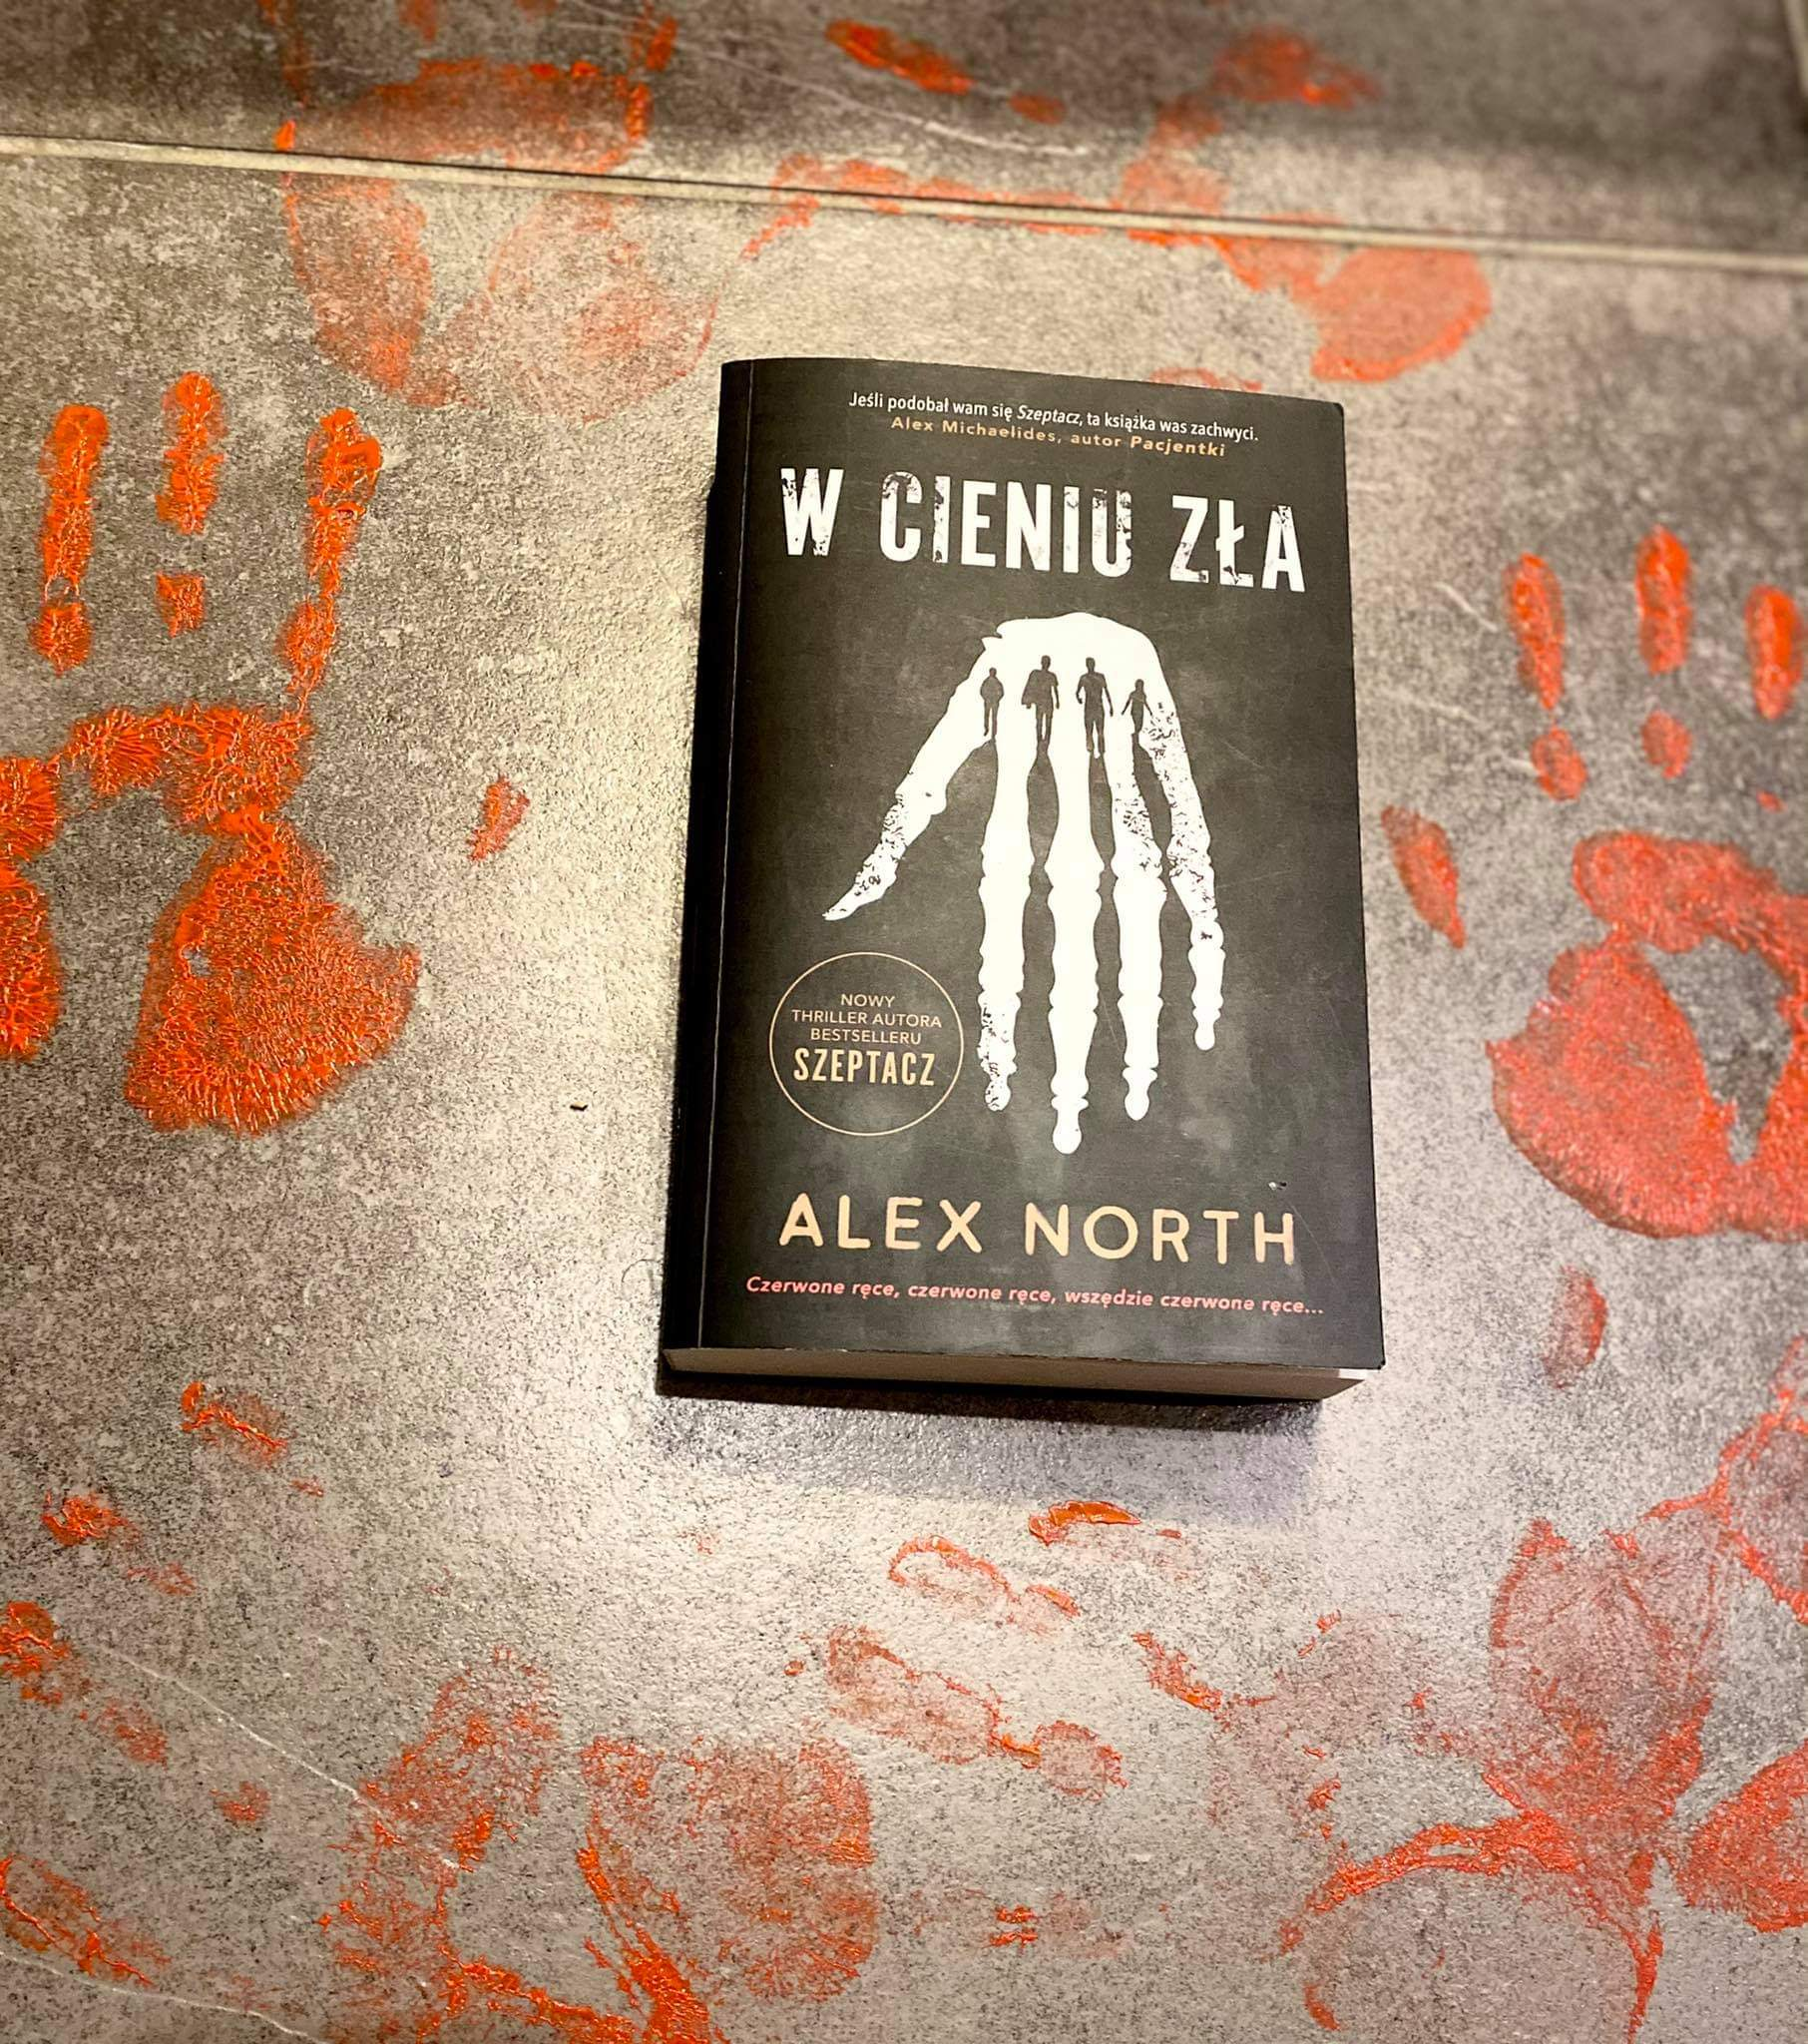 Alex North - W cieniu zła